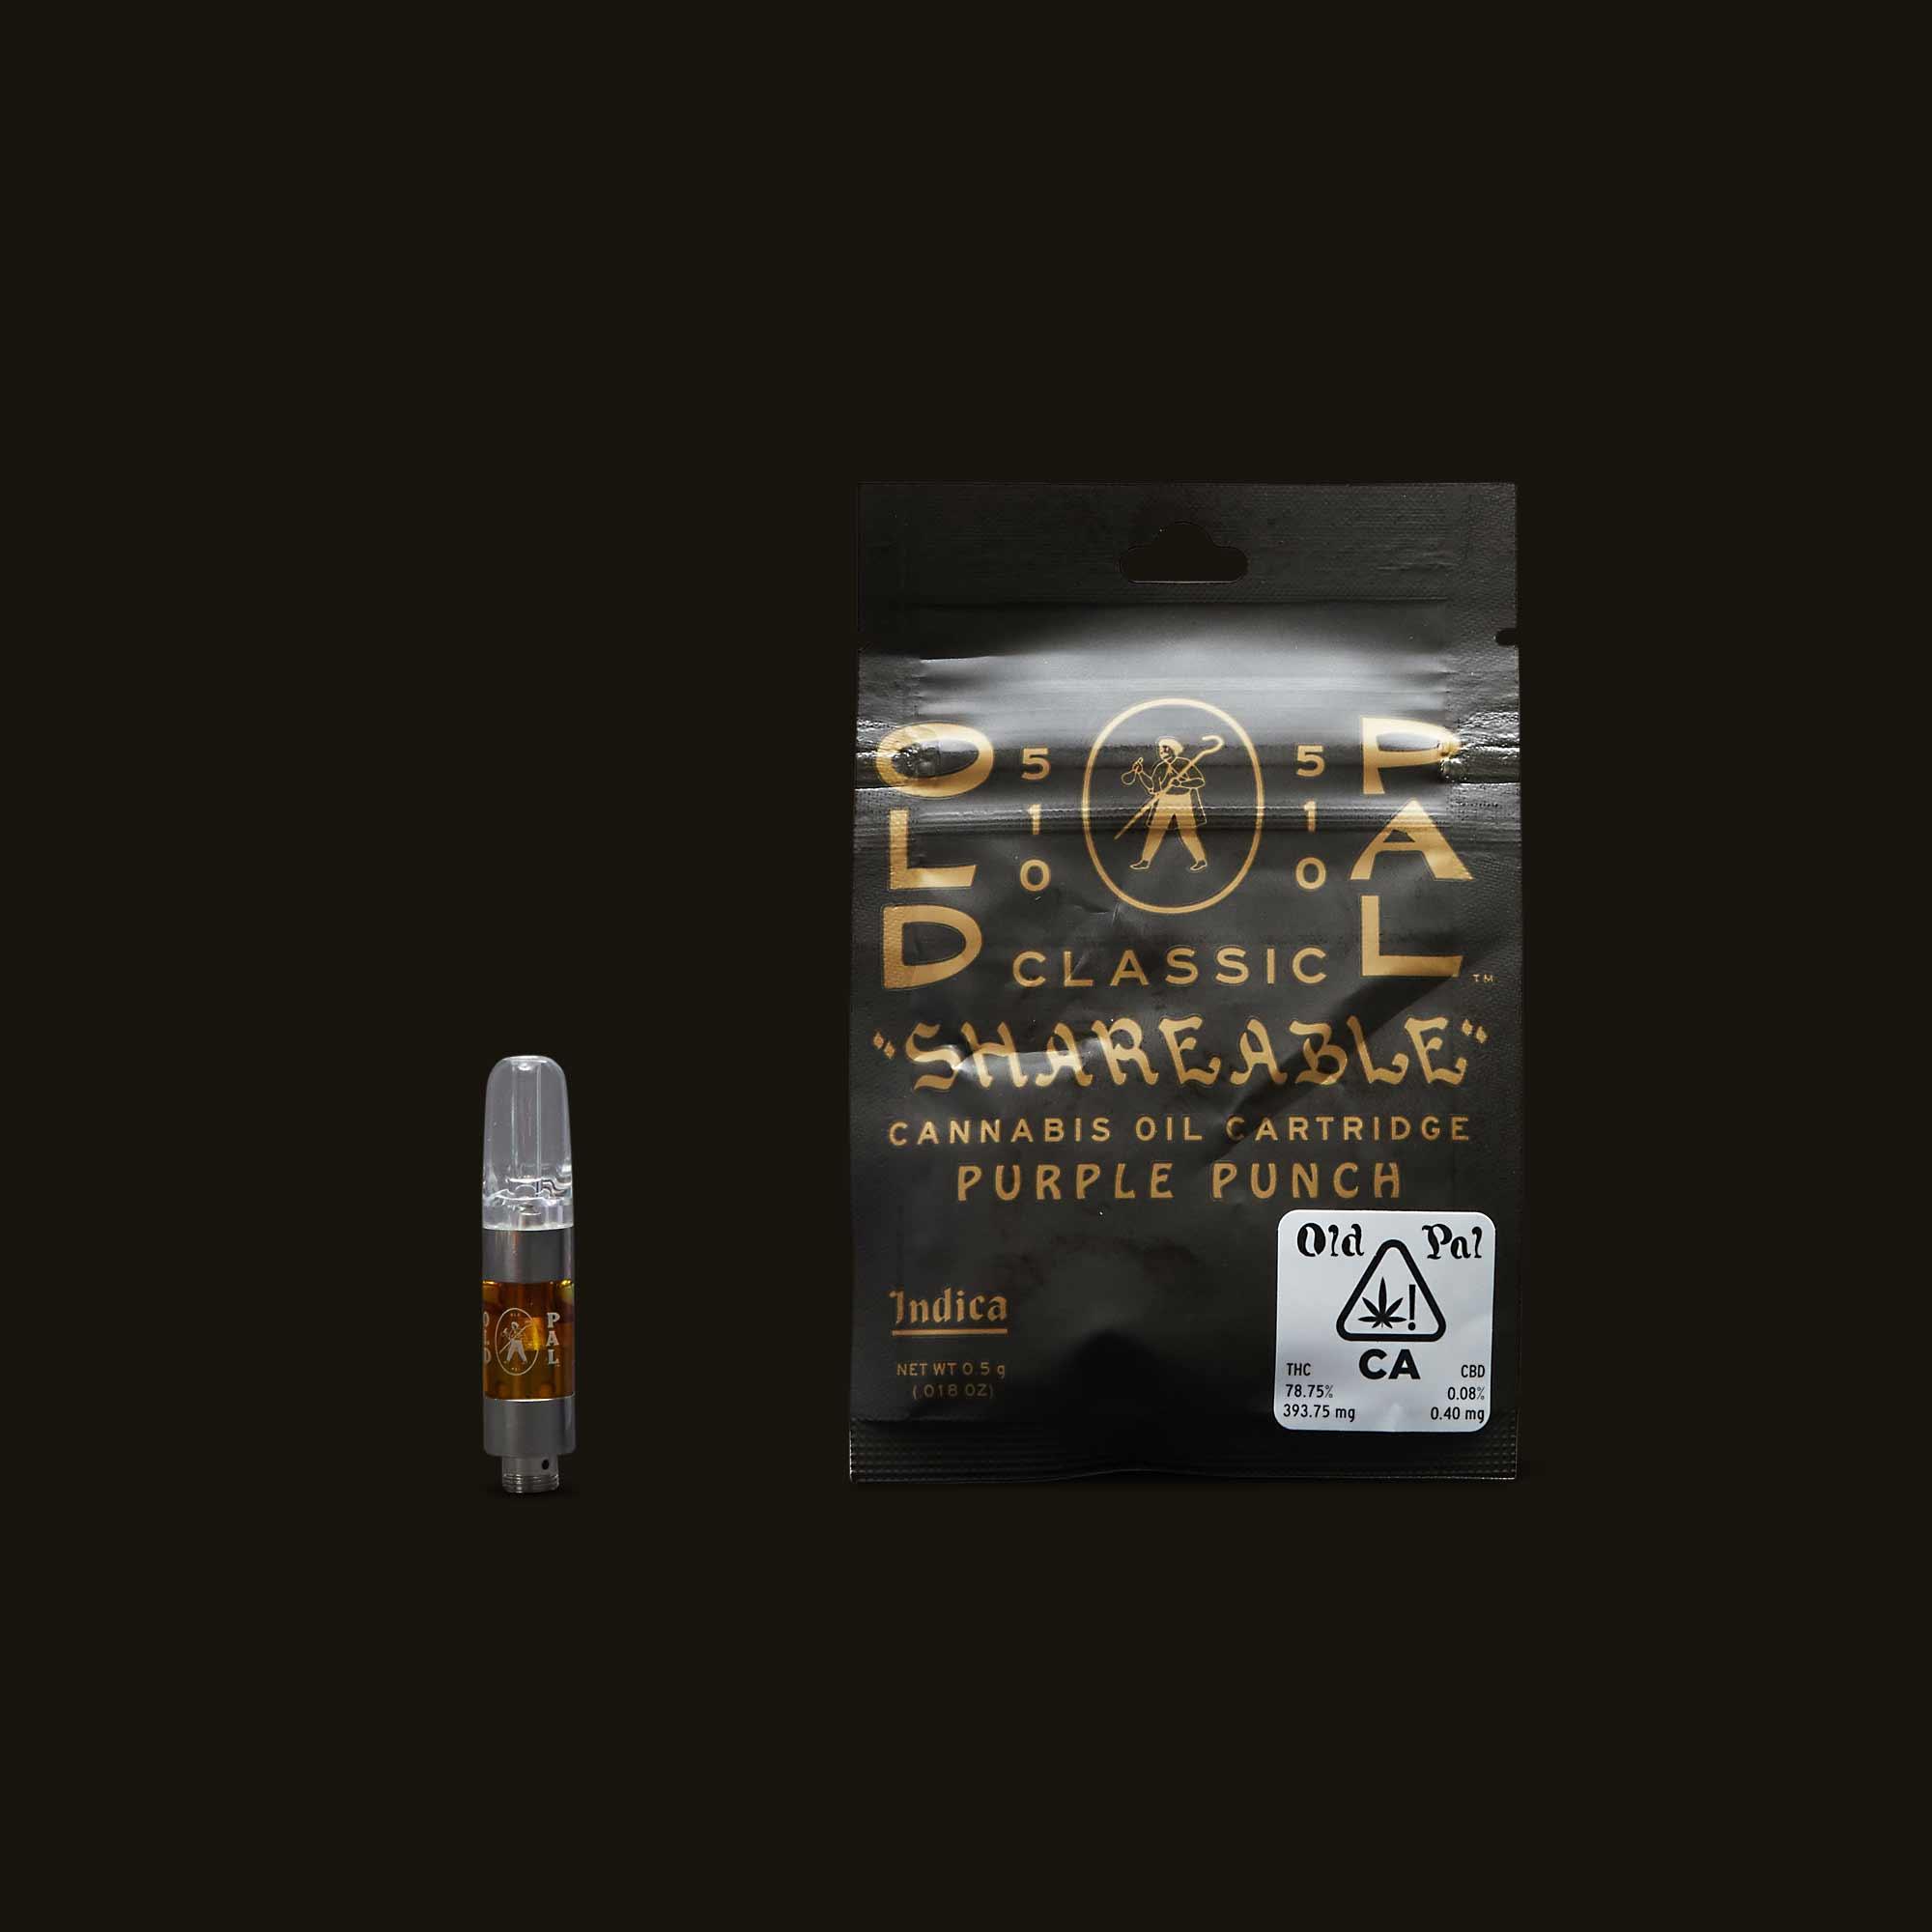 OLD PAL Purple Punch Cartridge - 0.5g